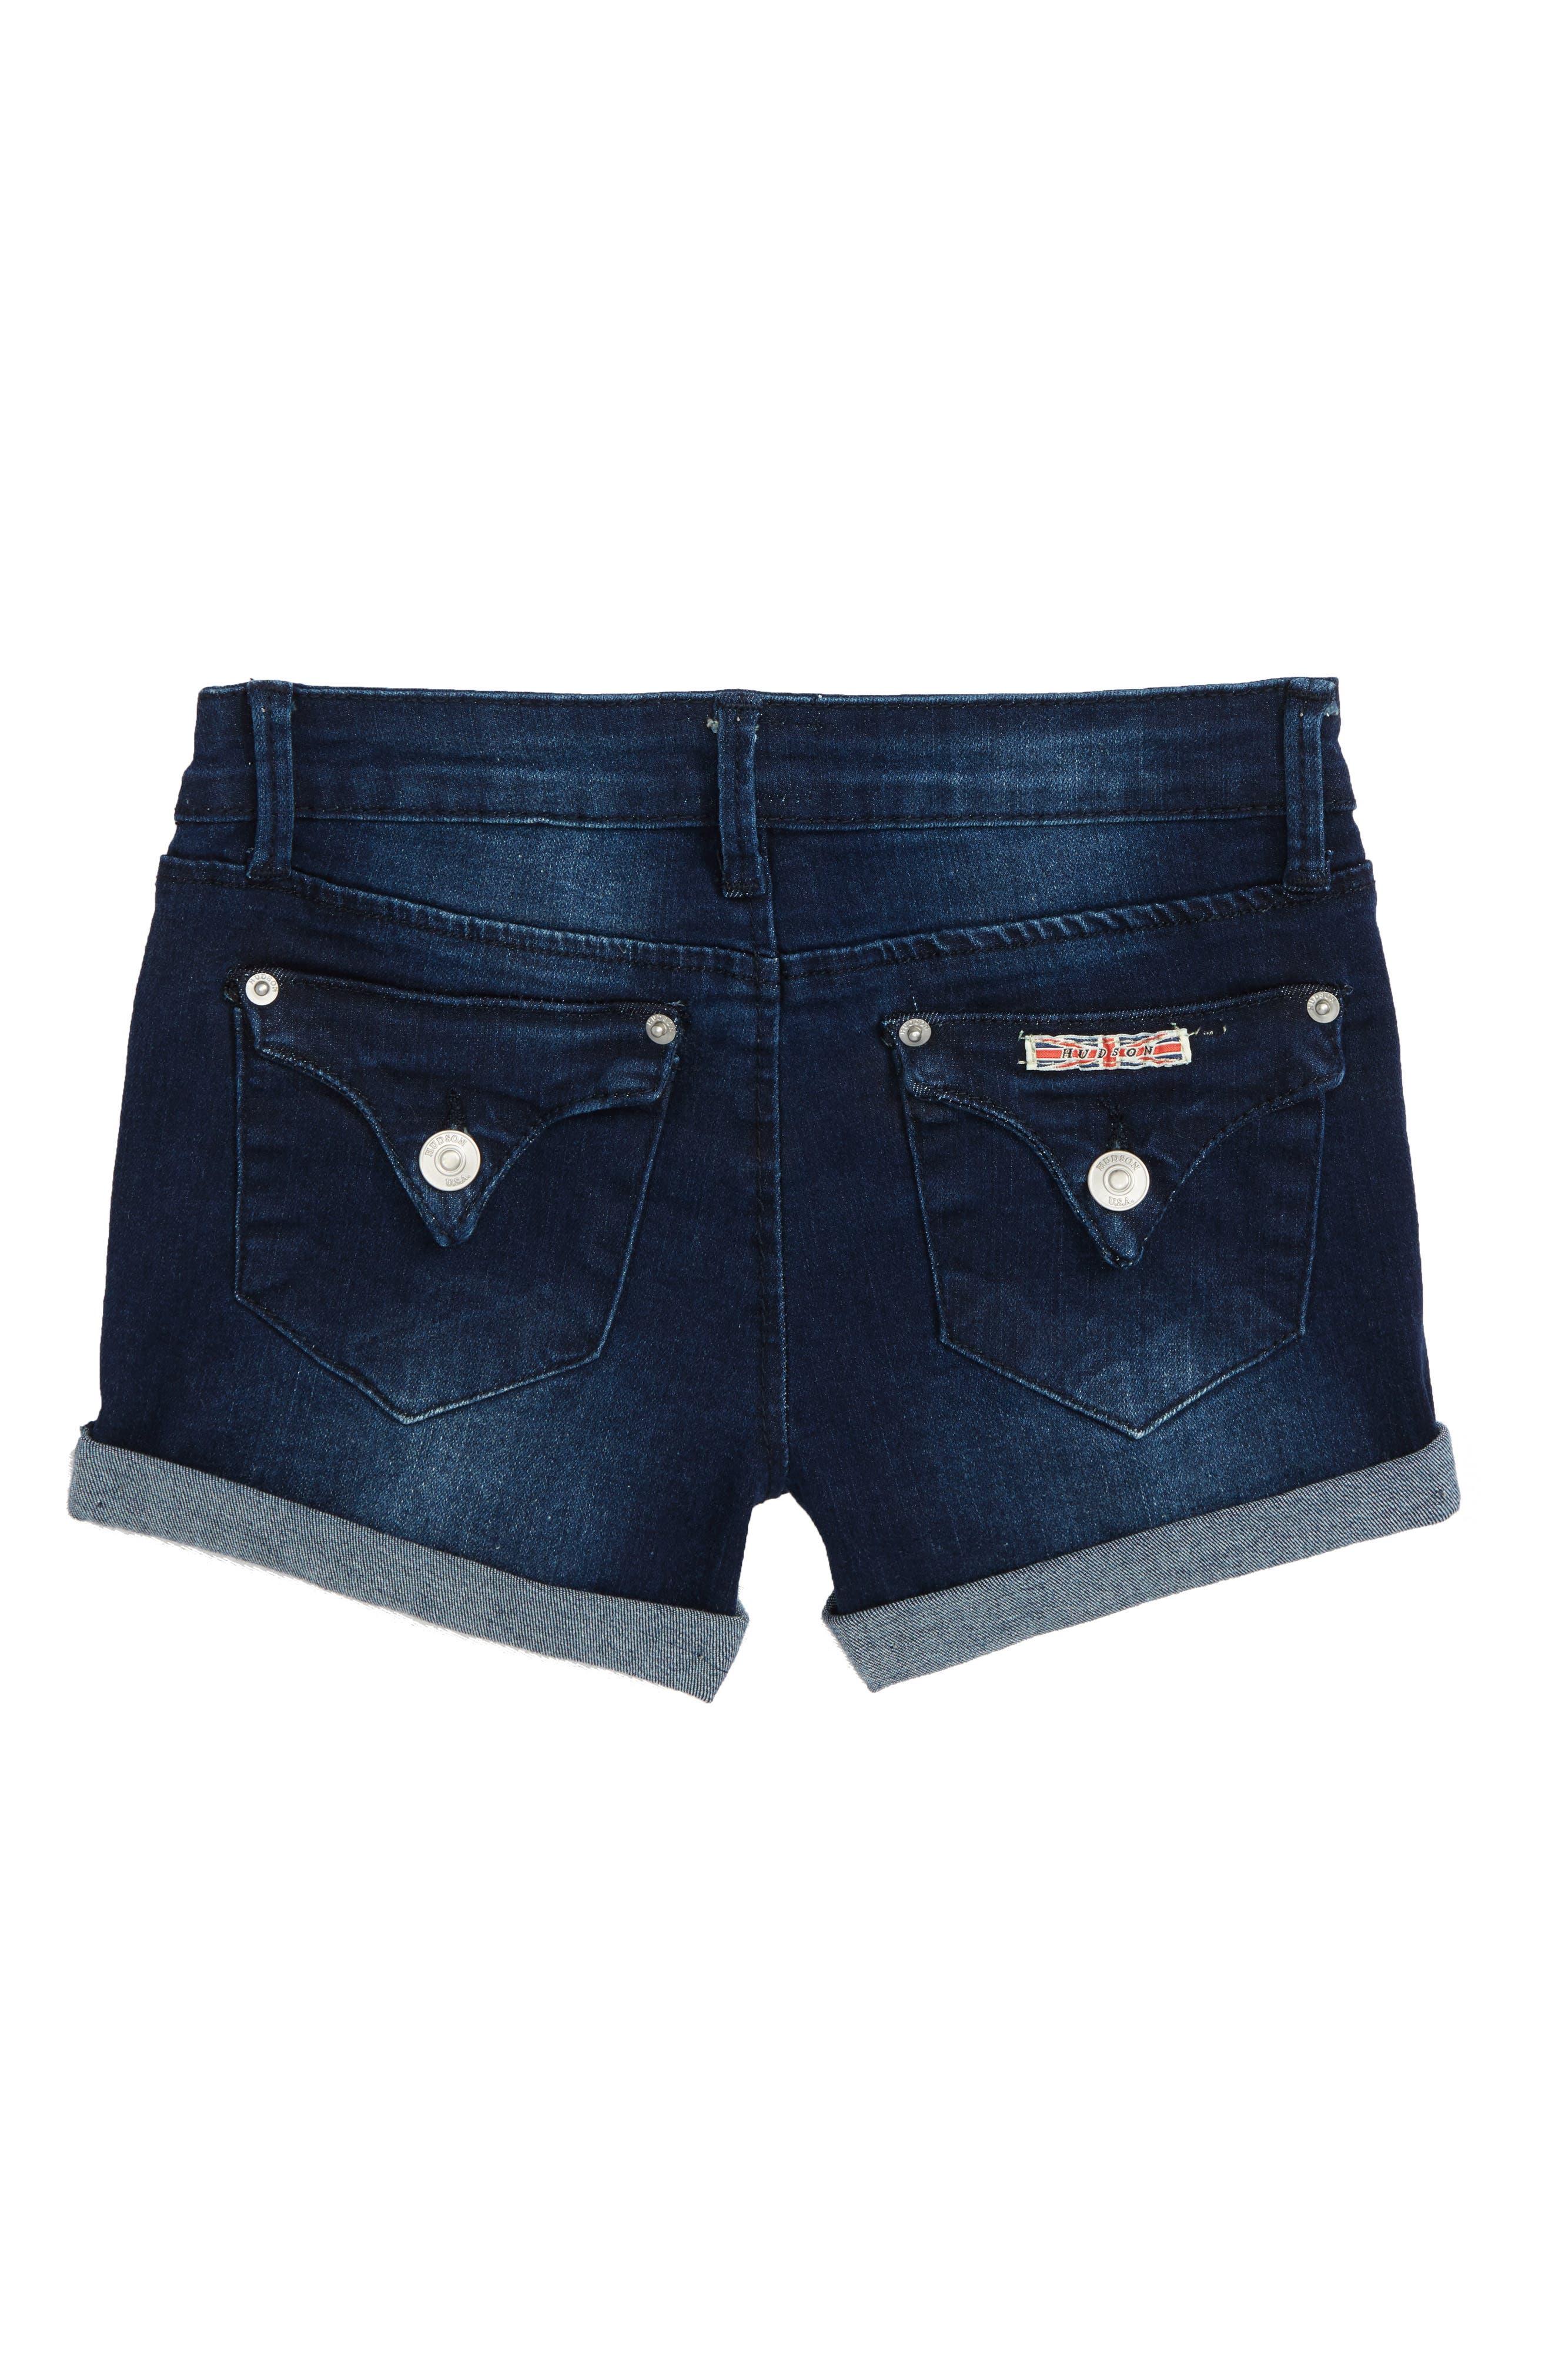 Roll Cuff Denim Shorts,                             Alternate thumbnail 2, color,                             Low Octane